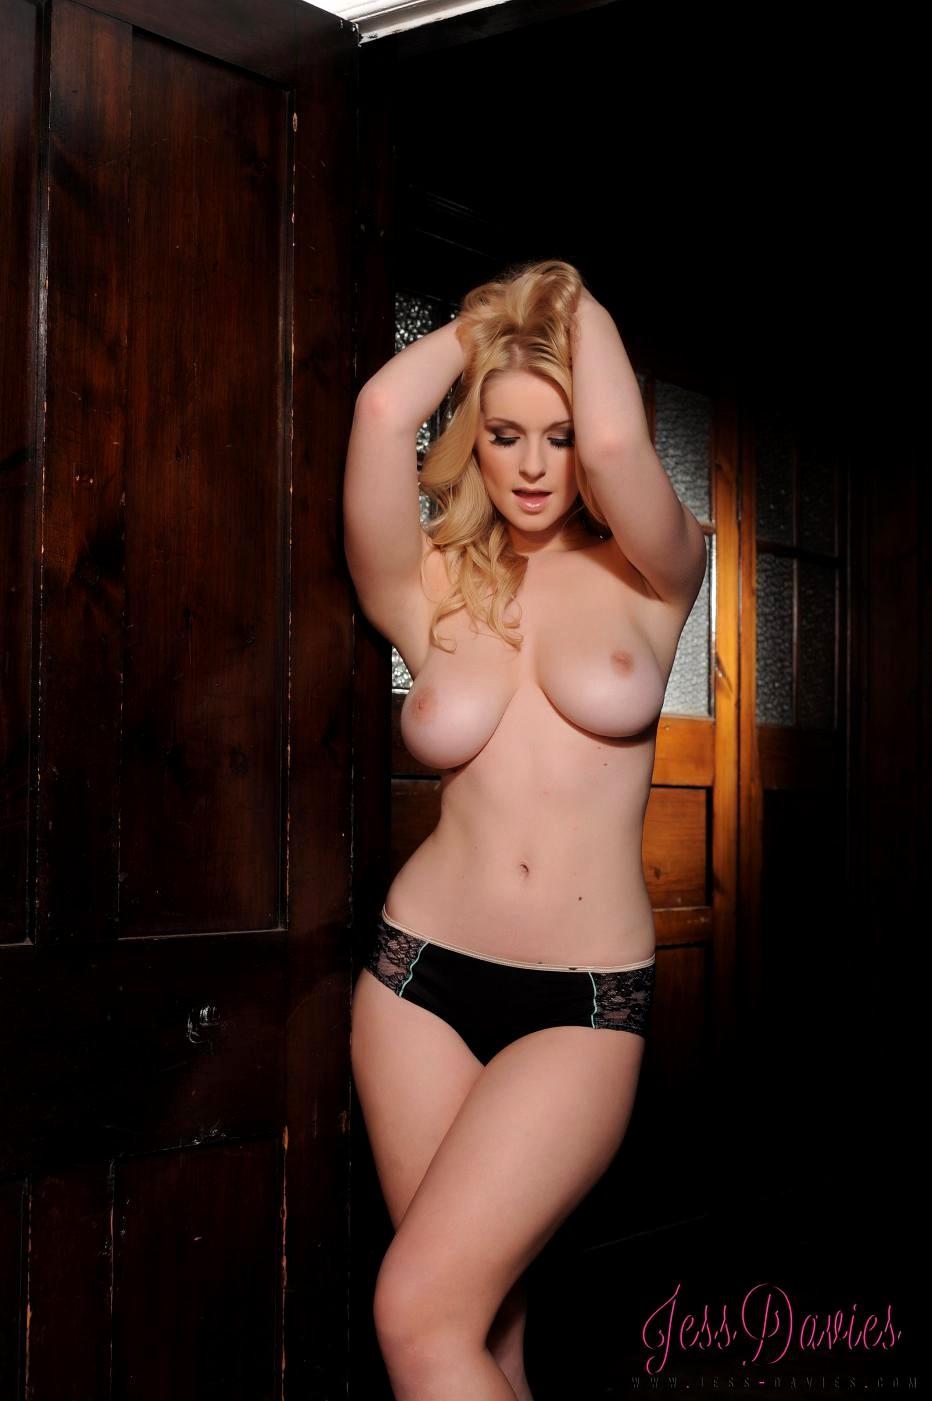 Busty Jess 94